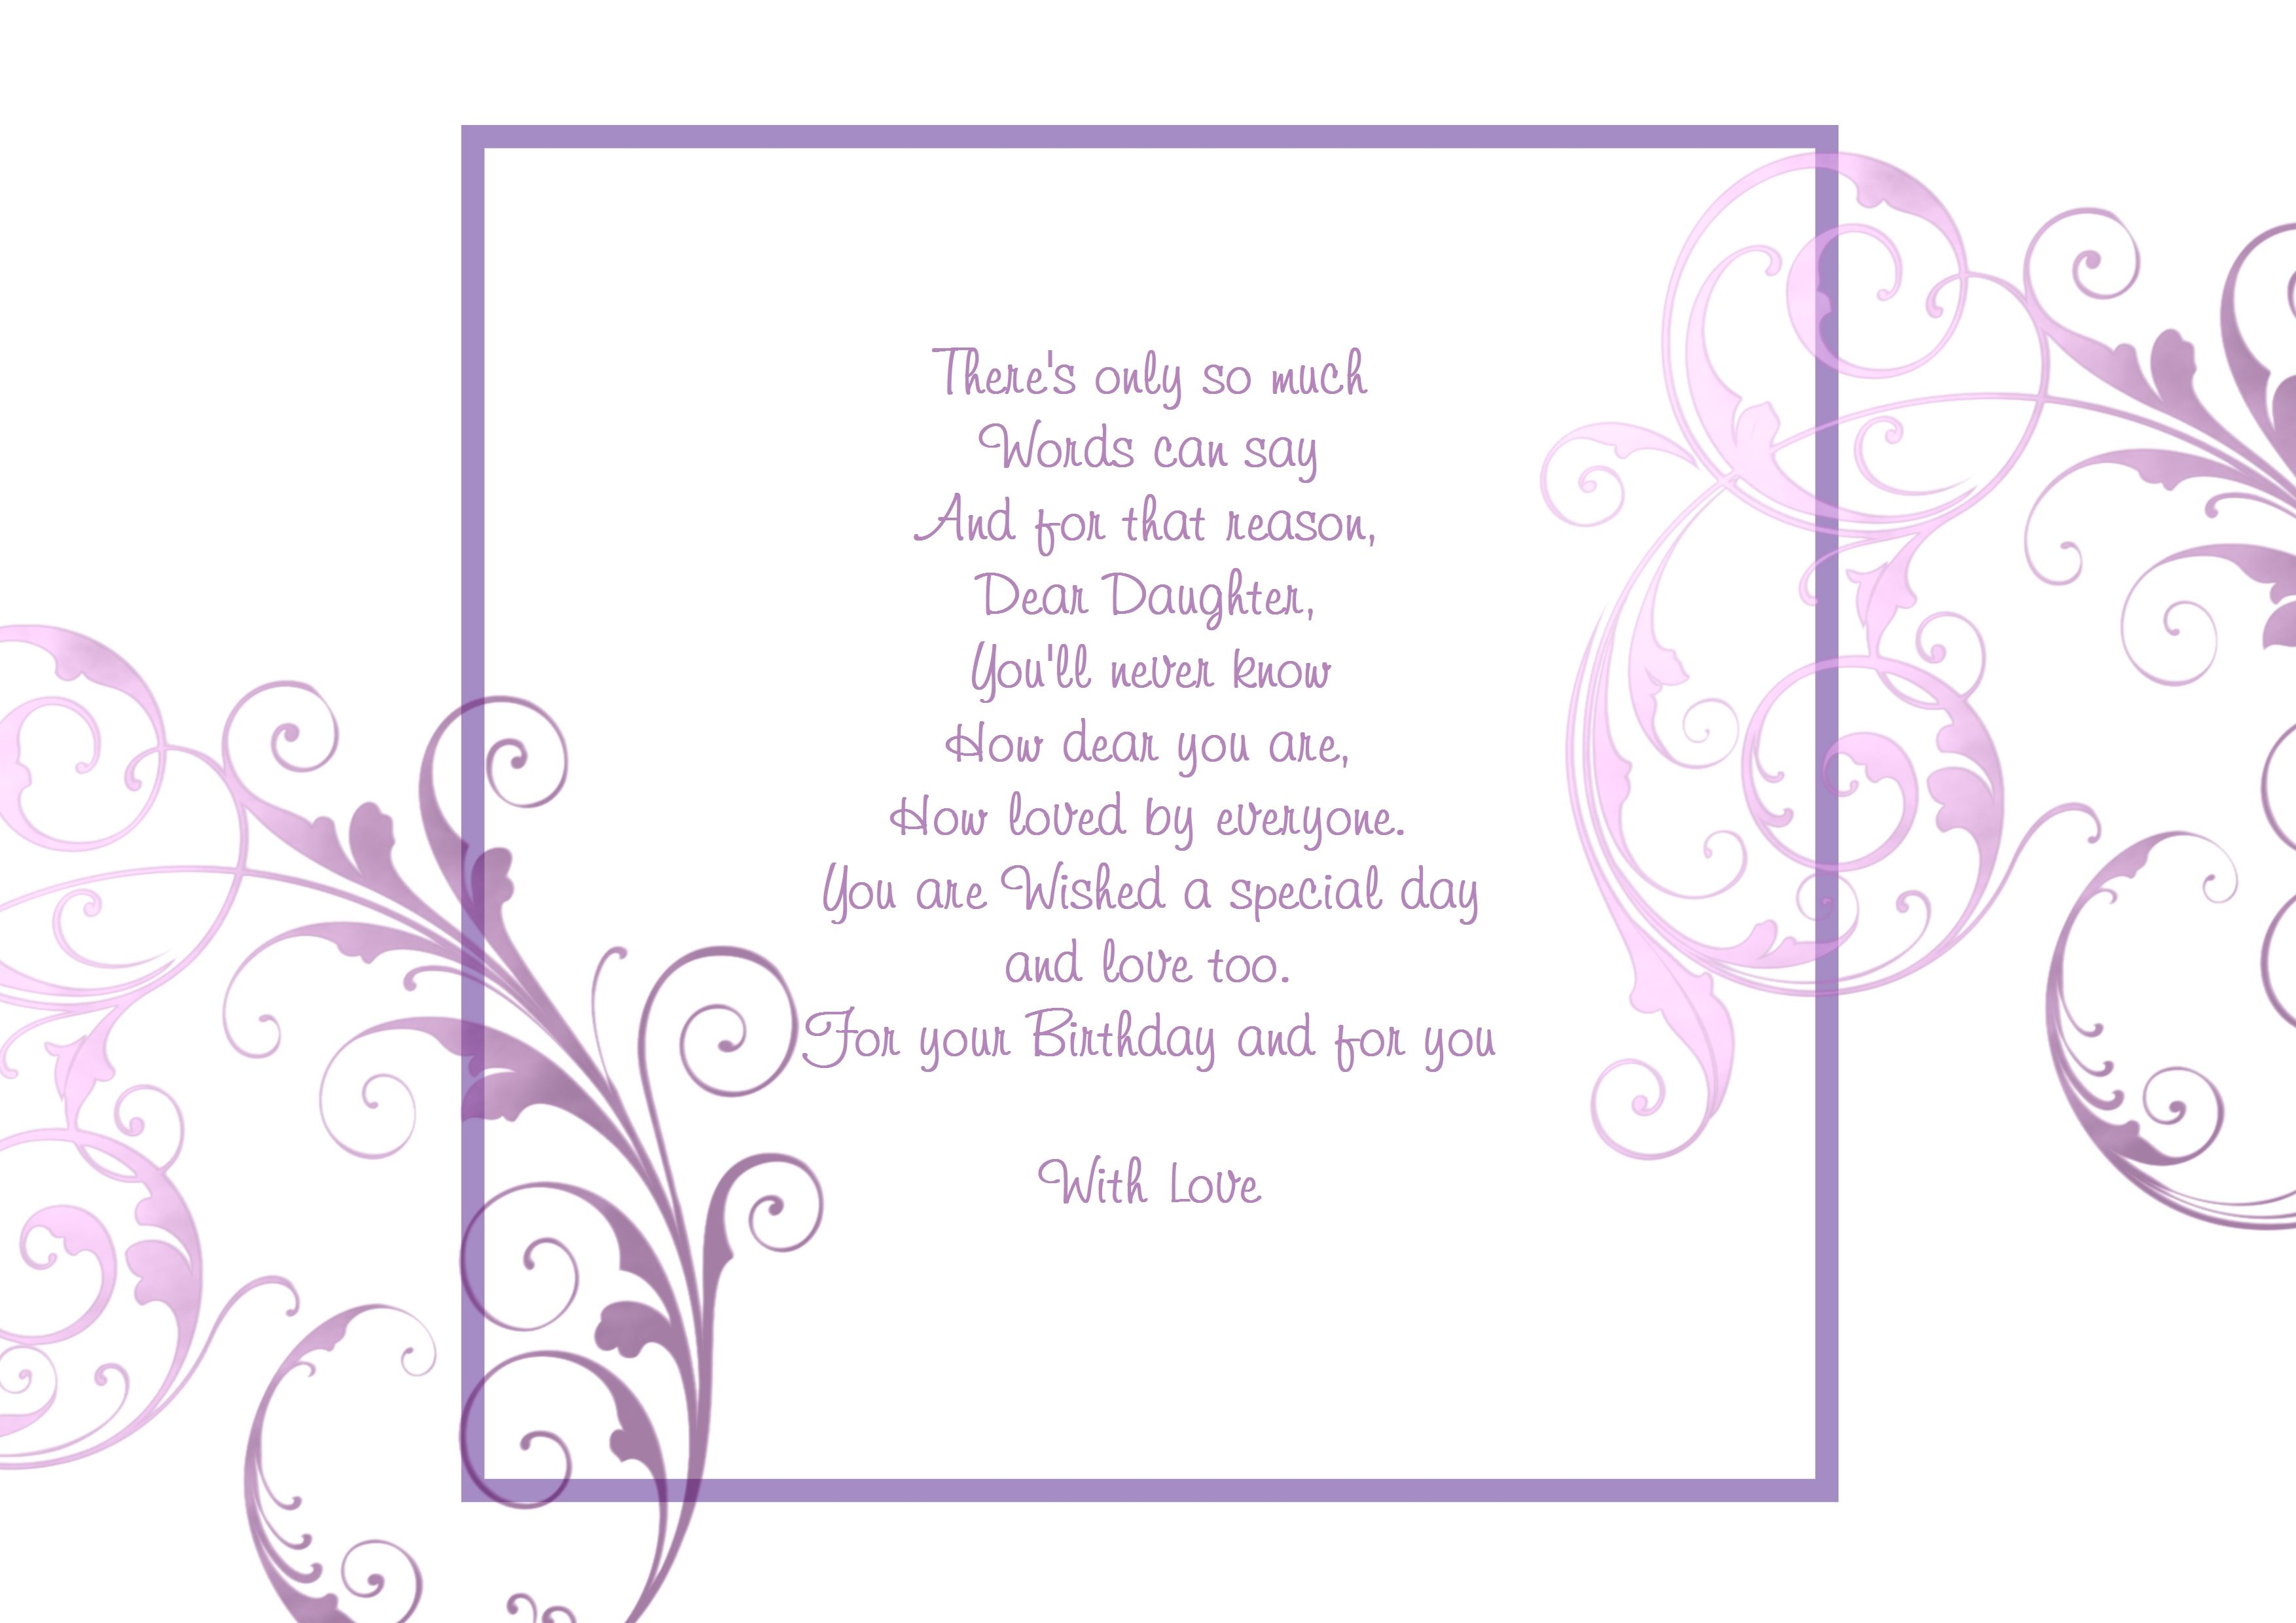 Birthday - Daughter  Birthday verses for cards, Cards handmade